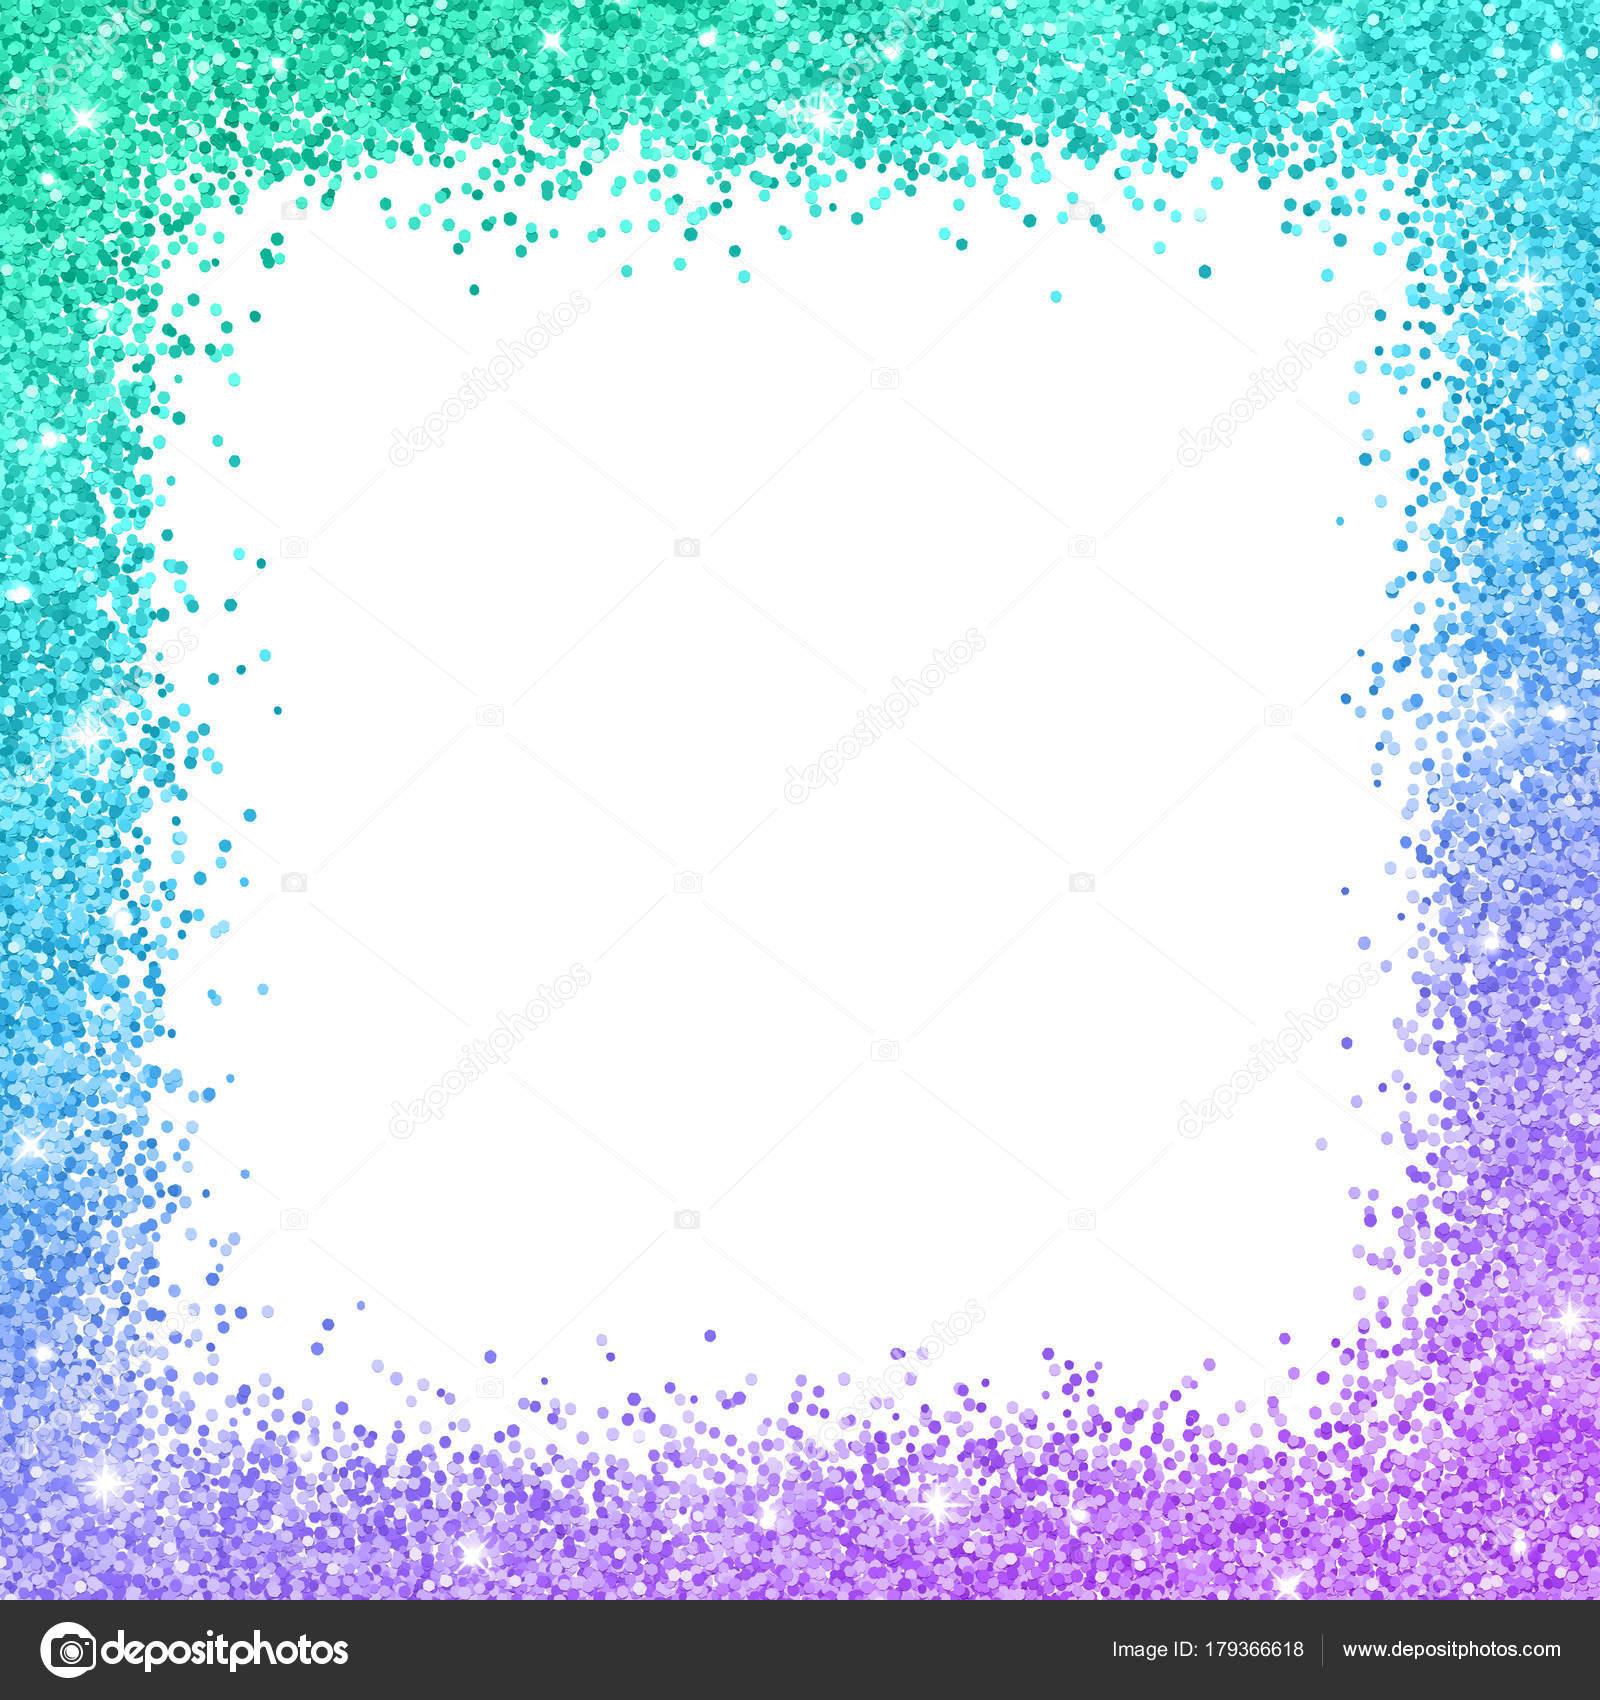 Marco de frontera brillo con efecto de color púrpura azul turquesa ...